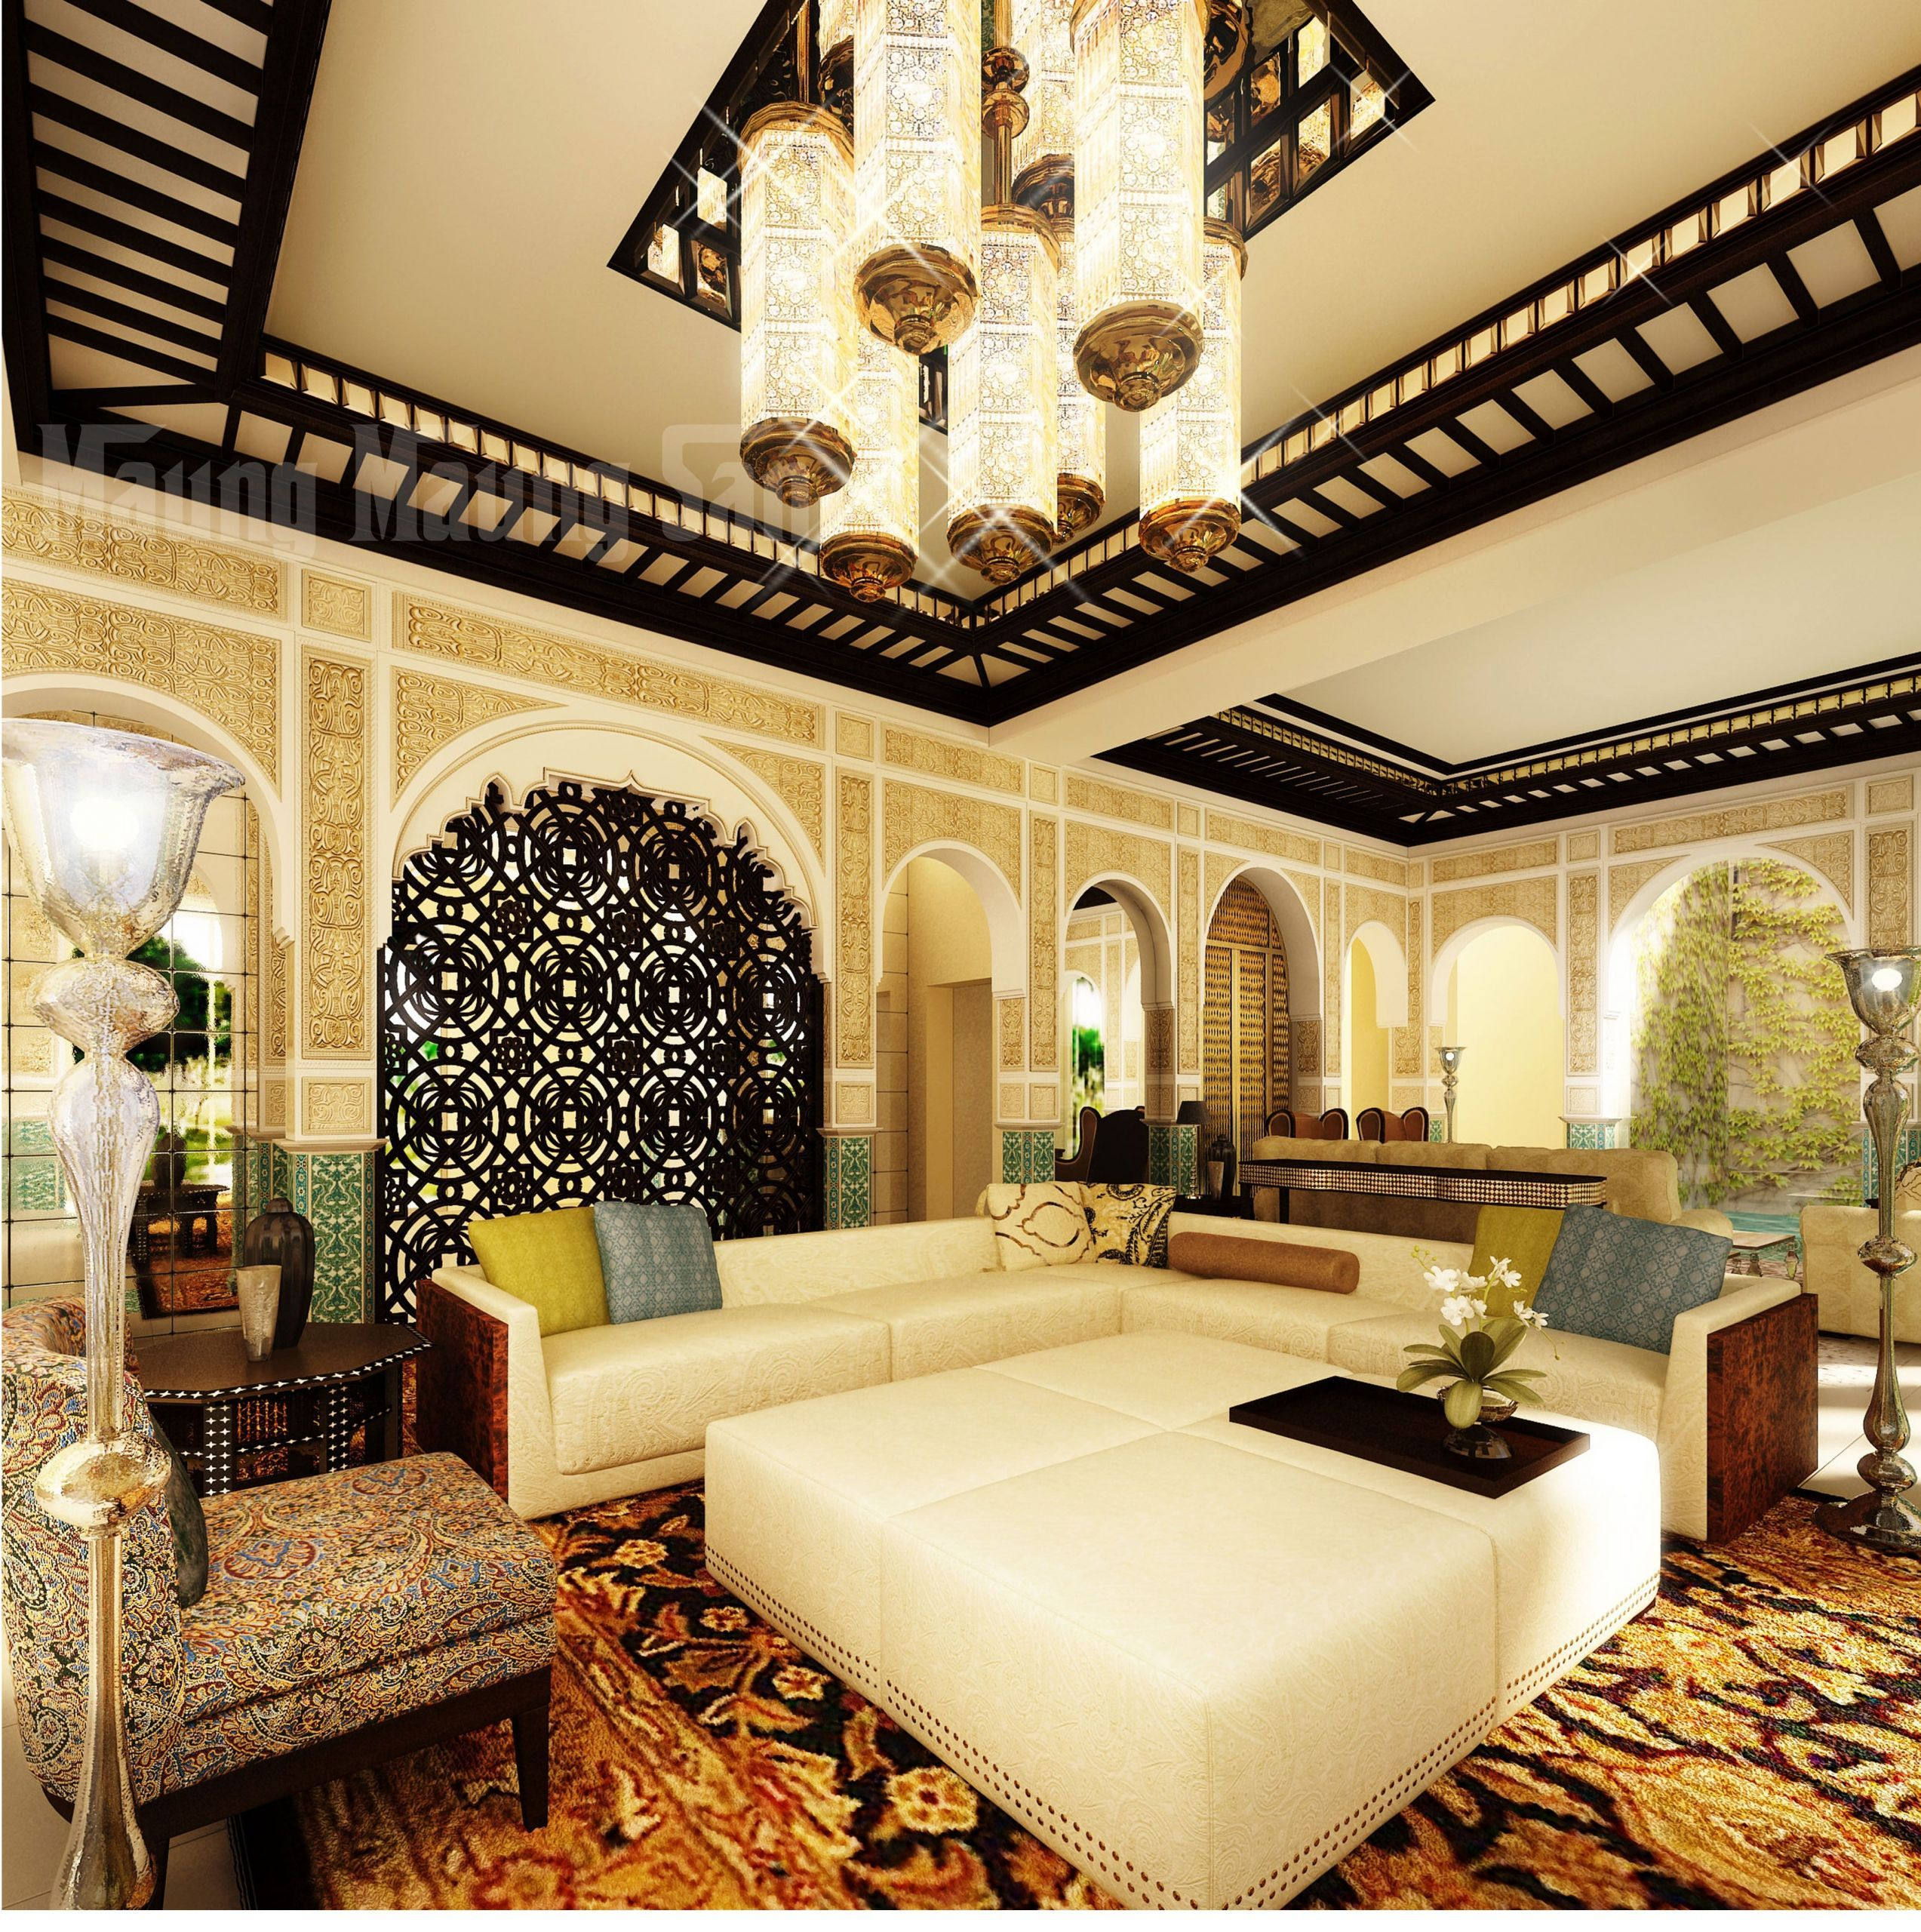 H3 Unique Middle Eastern Home Decor H3 Https Www Toplivingroom Com Unique Middle Eastern Home Decor Desain Moroccan living room designs